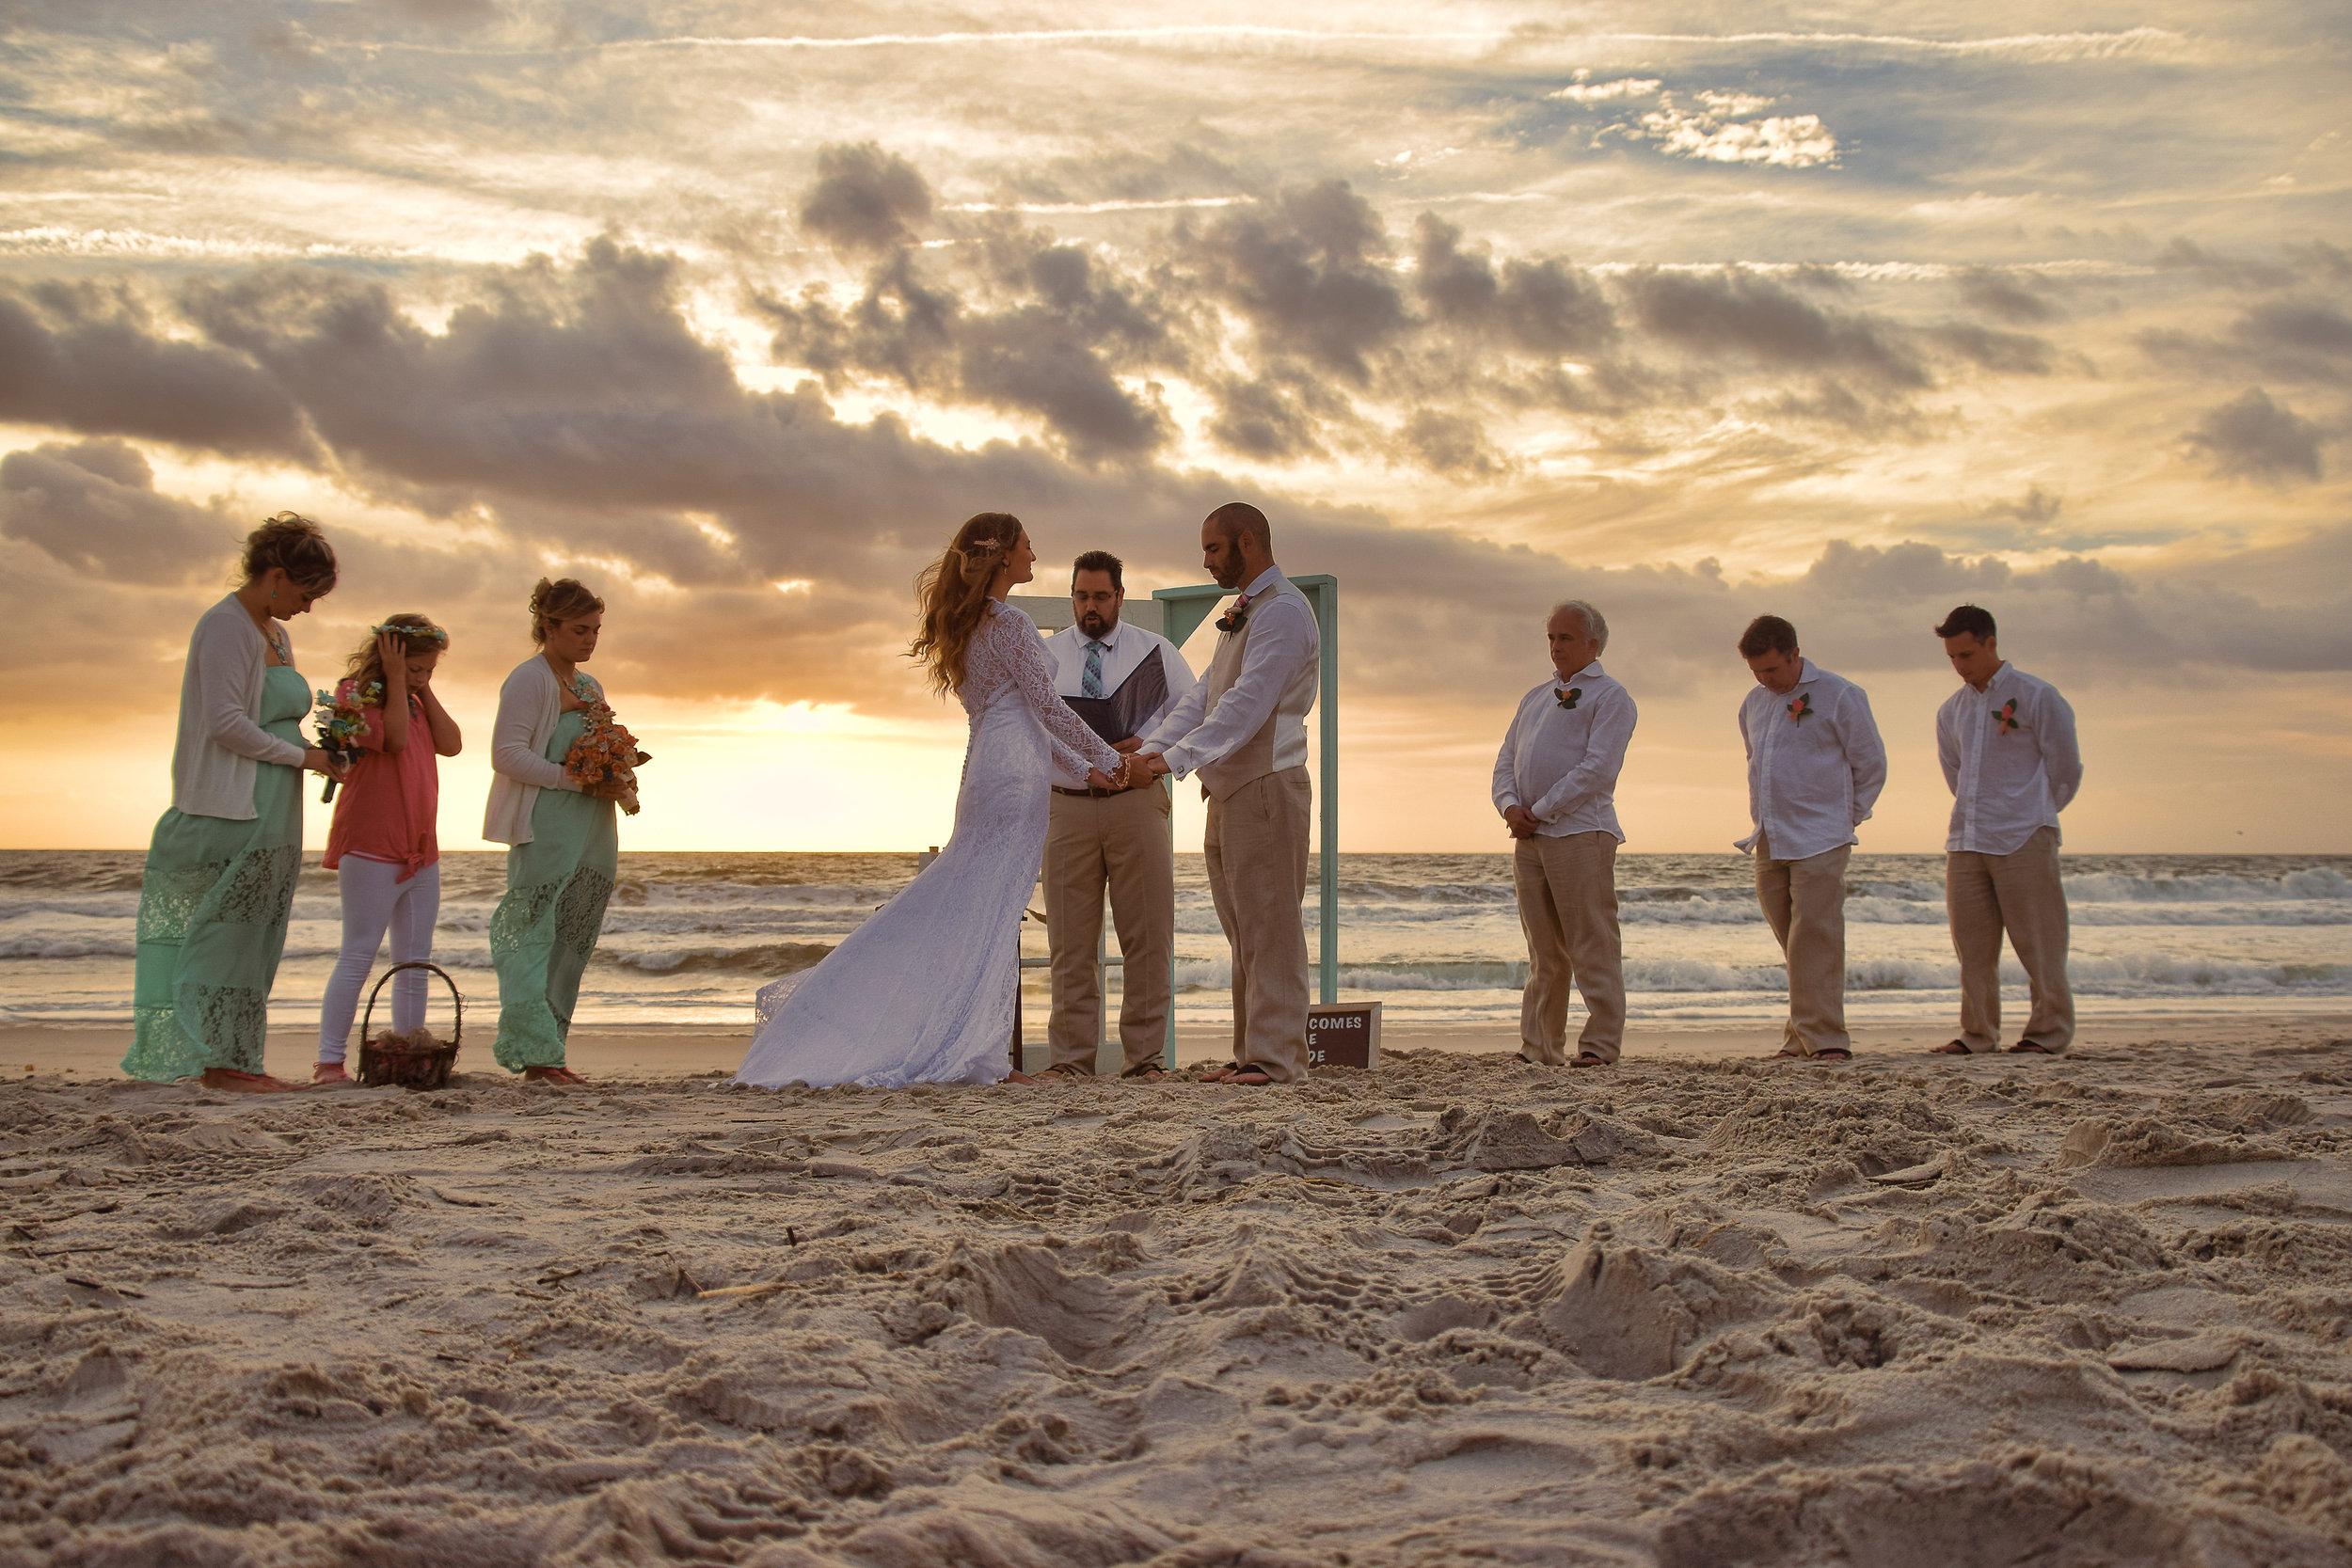 Sunrise - A simple sunrise wedding at Carolina Beach, NC. Billy Beach Photography.